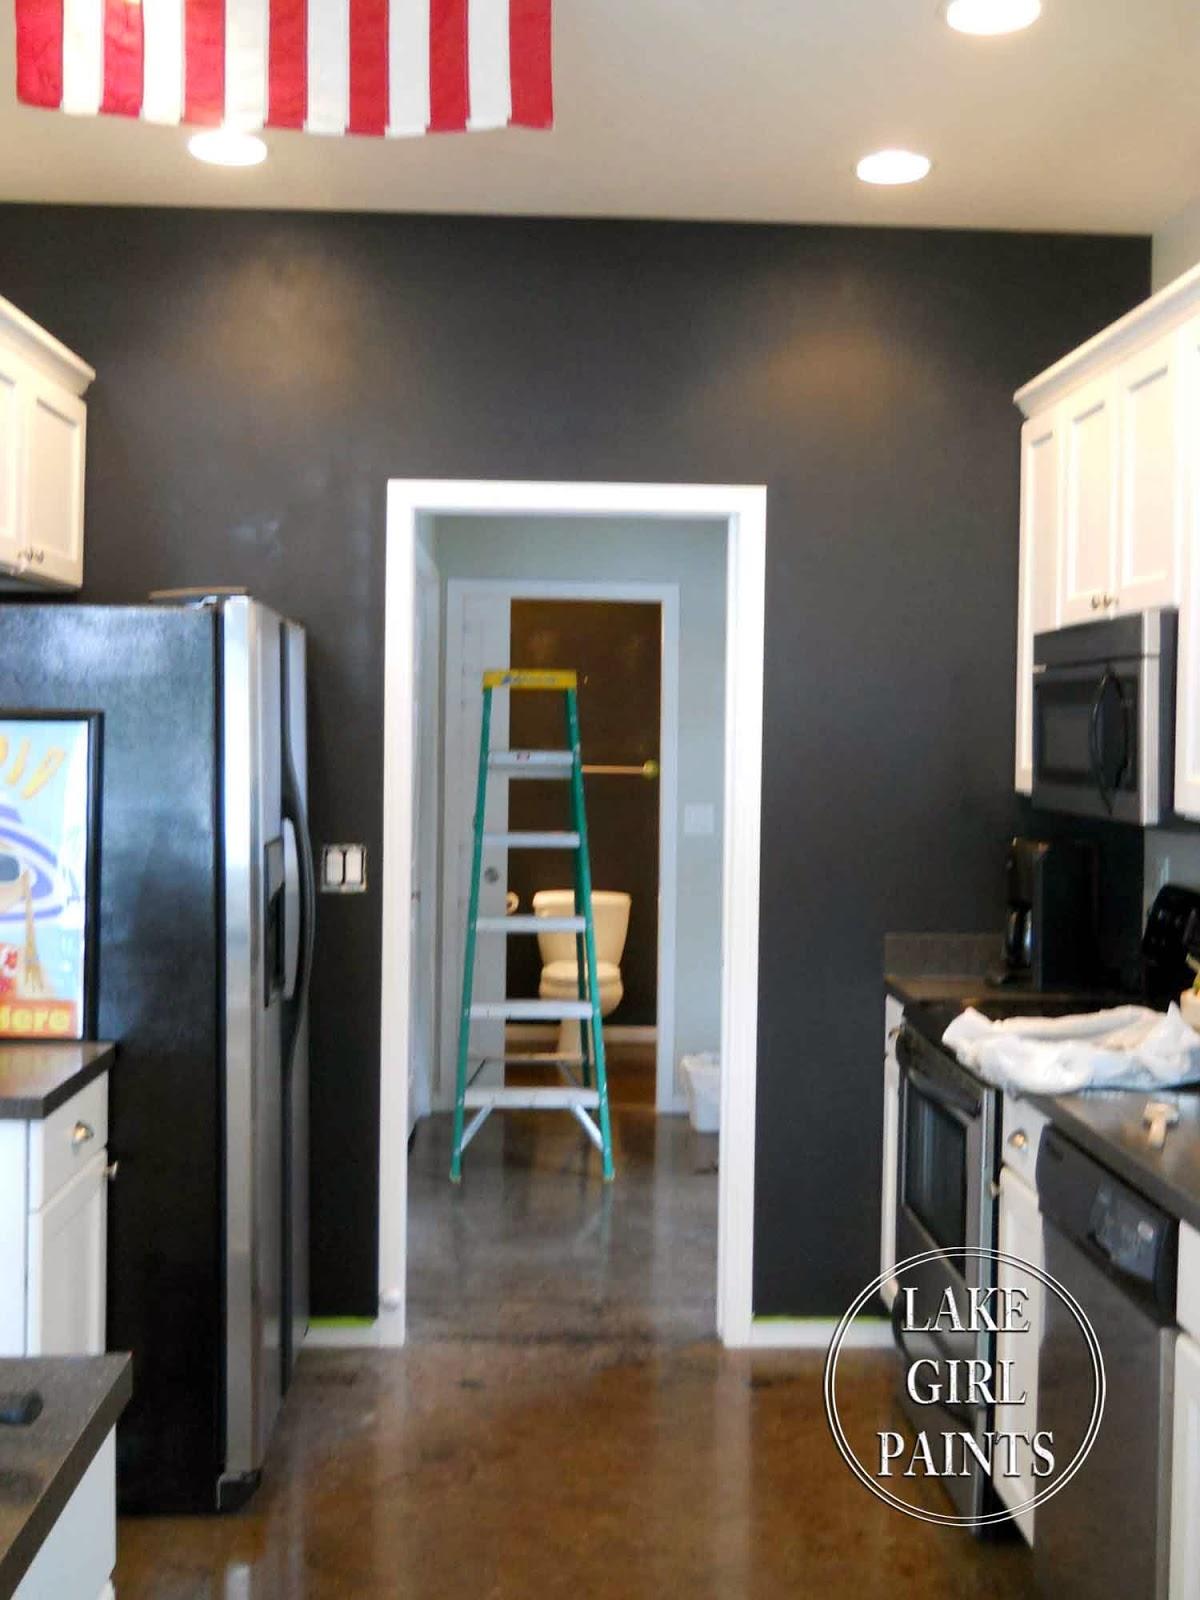 Chalkboard Paint Kitchen Lake Girl Paints Painting My Kitchen Wall With Chalkboard Paint